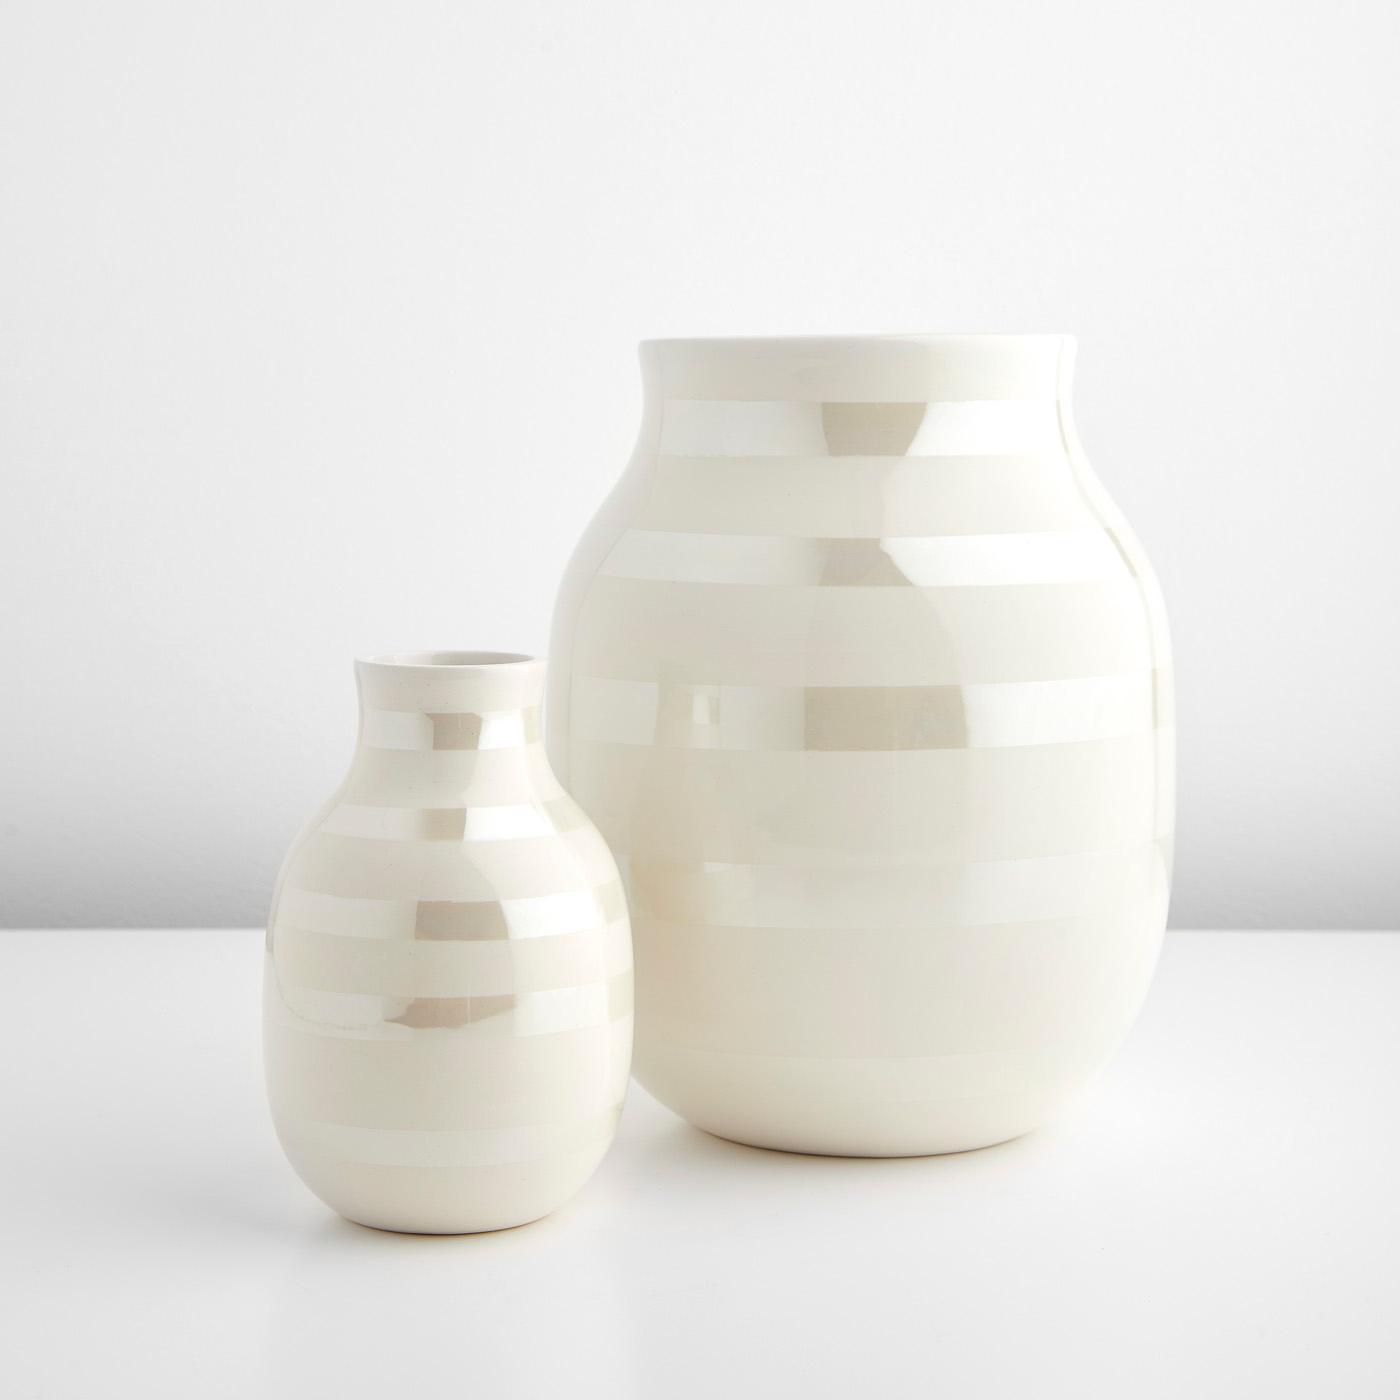 Omaggio Pearl Vases